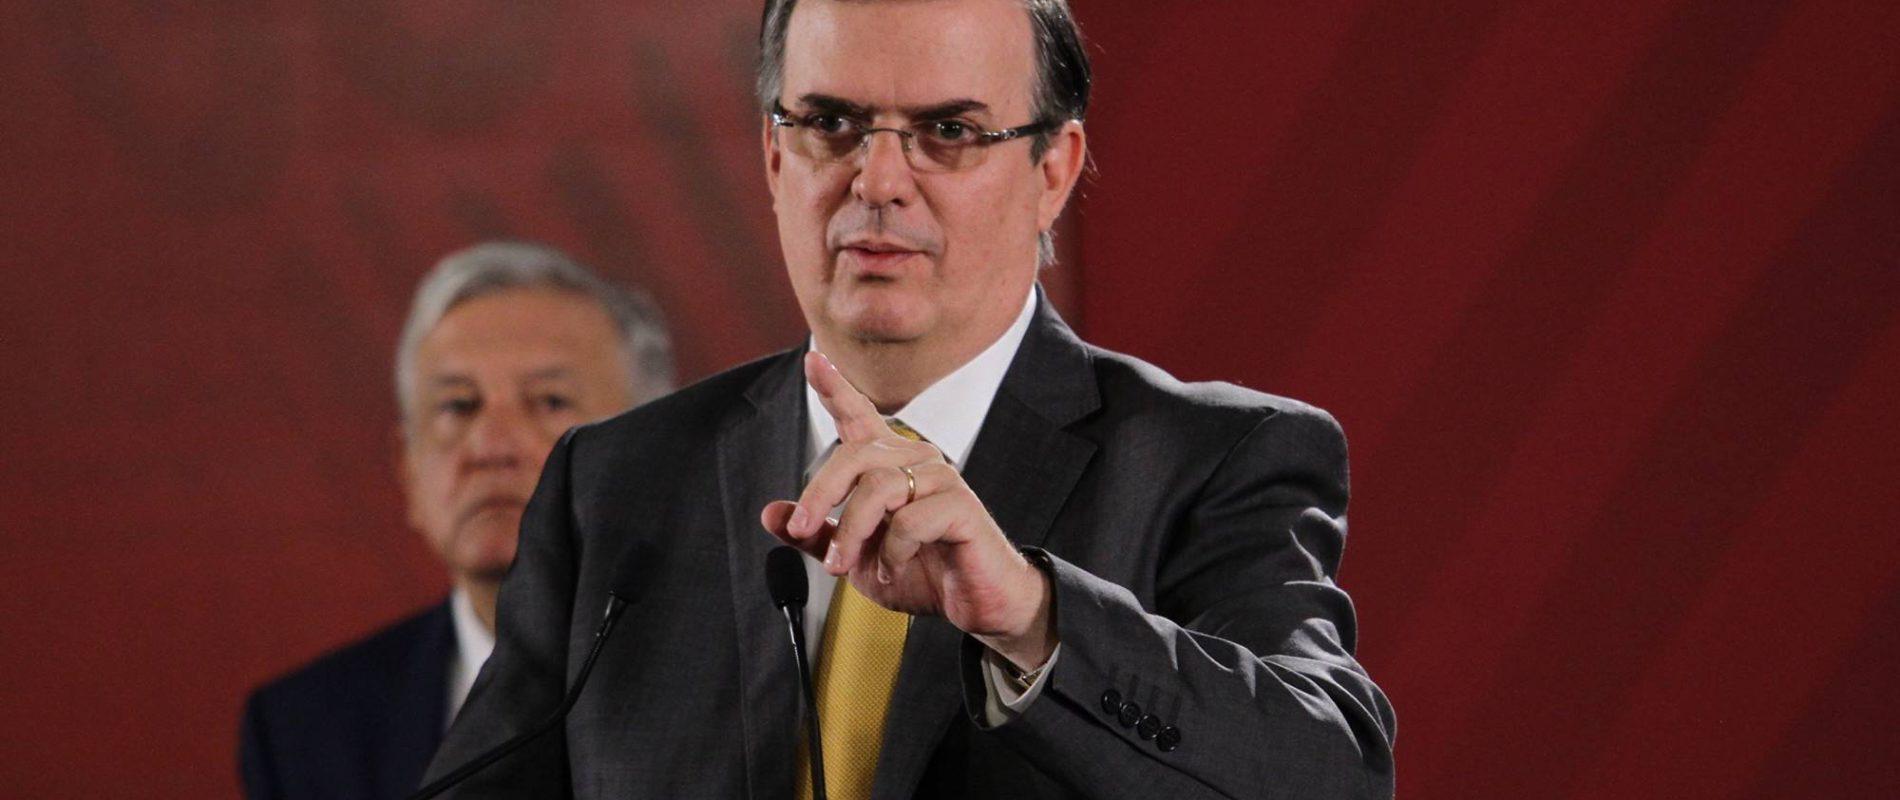 AMLO evalúa dependencias cada tres meses para que servicios públicos mejoren: Marcelo Ebrard